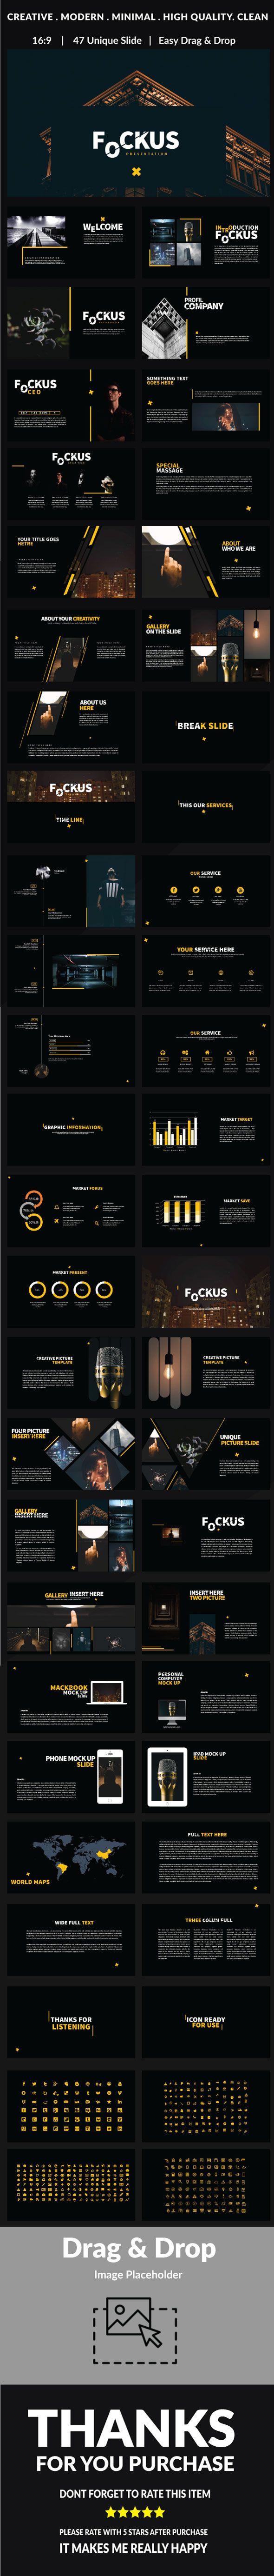 Fockus - Multipurpose Powerpoint - #PowerPoint #Templates #Presentation Templates Download here: https://graphicriver.net/item/fockus-multipurpose-powerpoint/19534286?ref=alena994